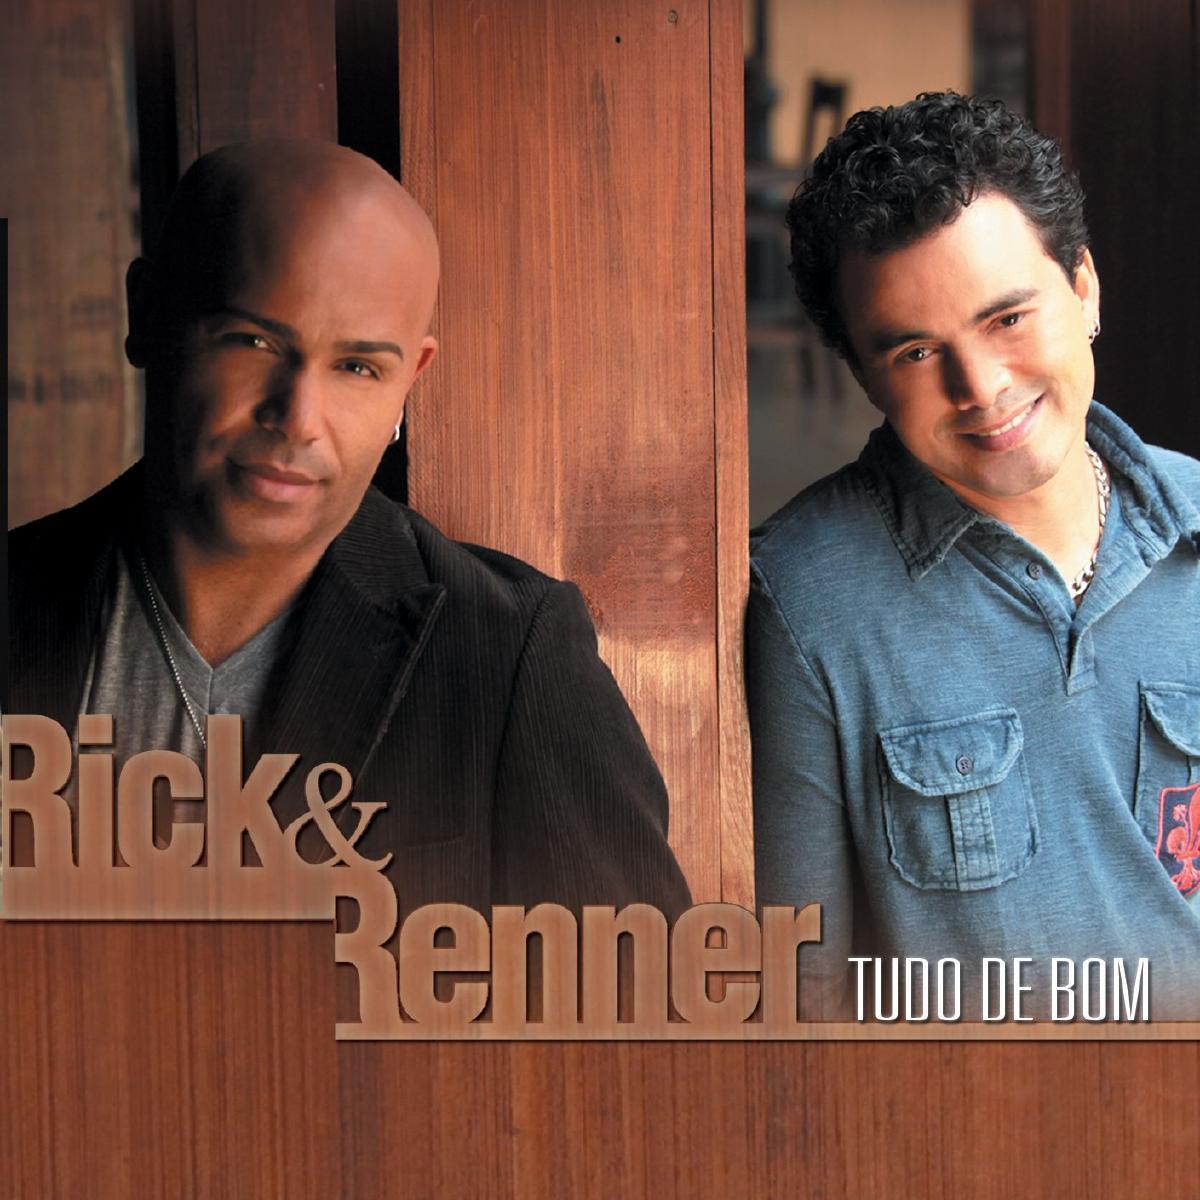 rick e renner credencial